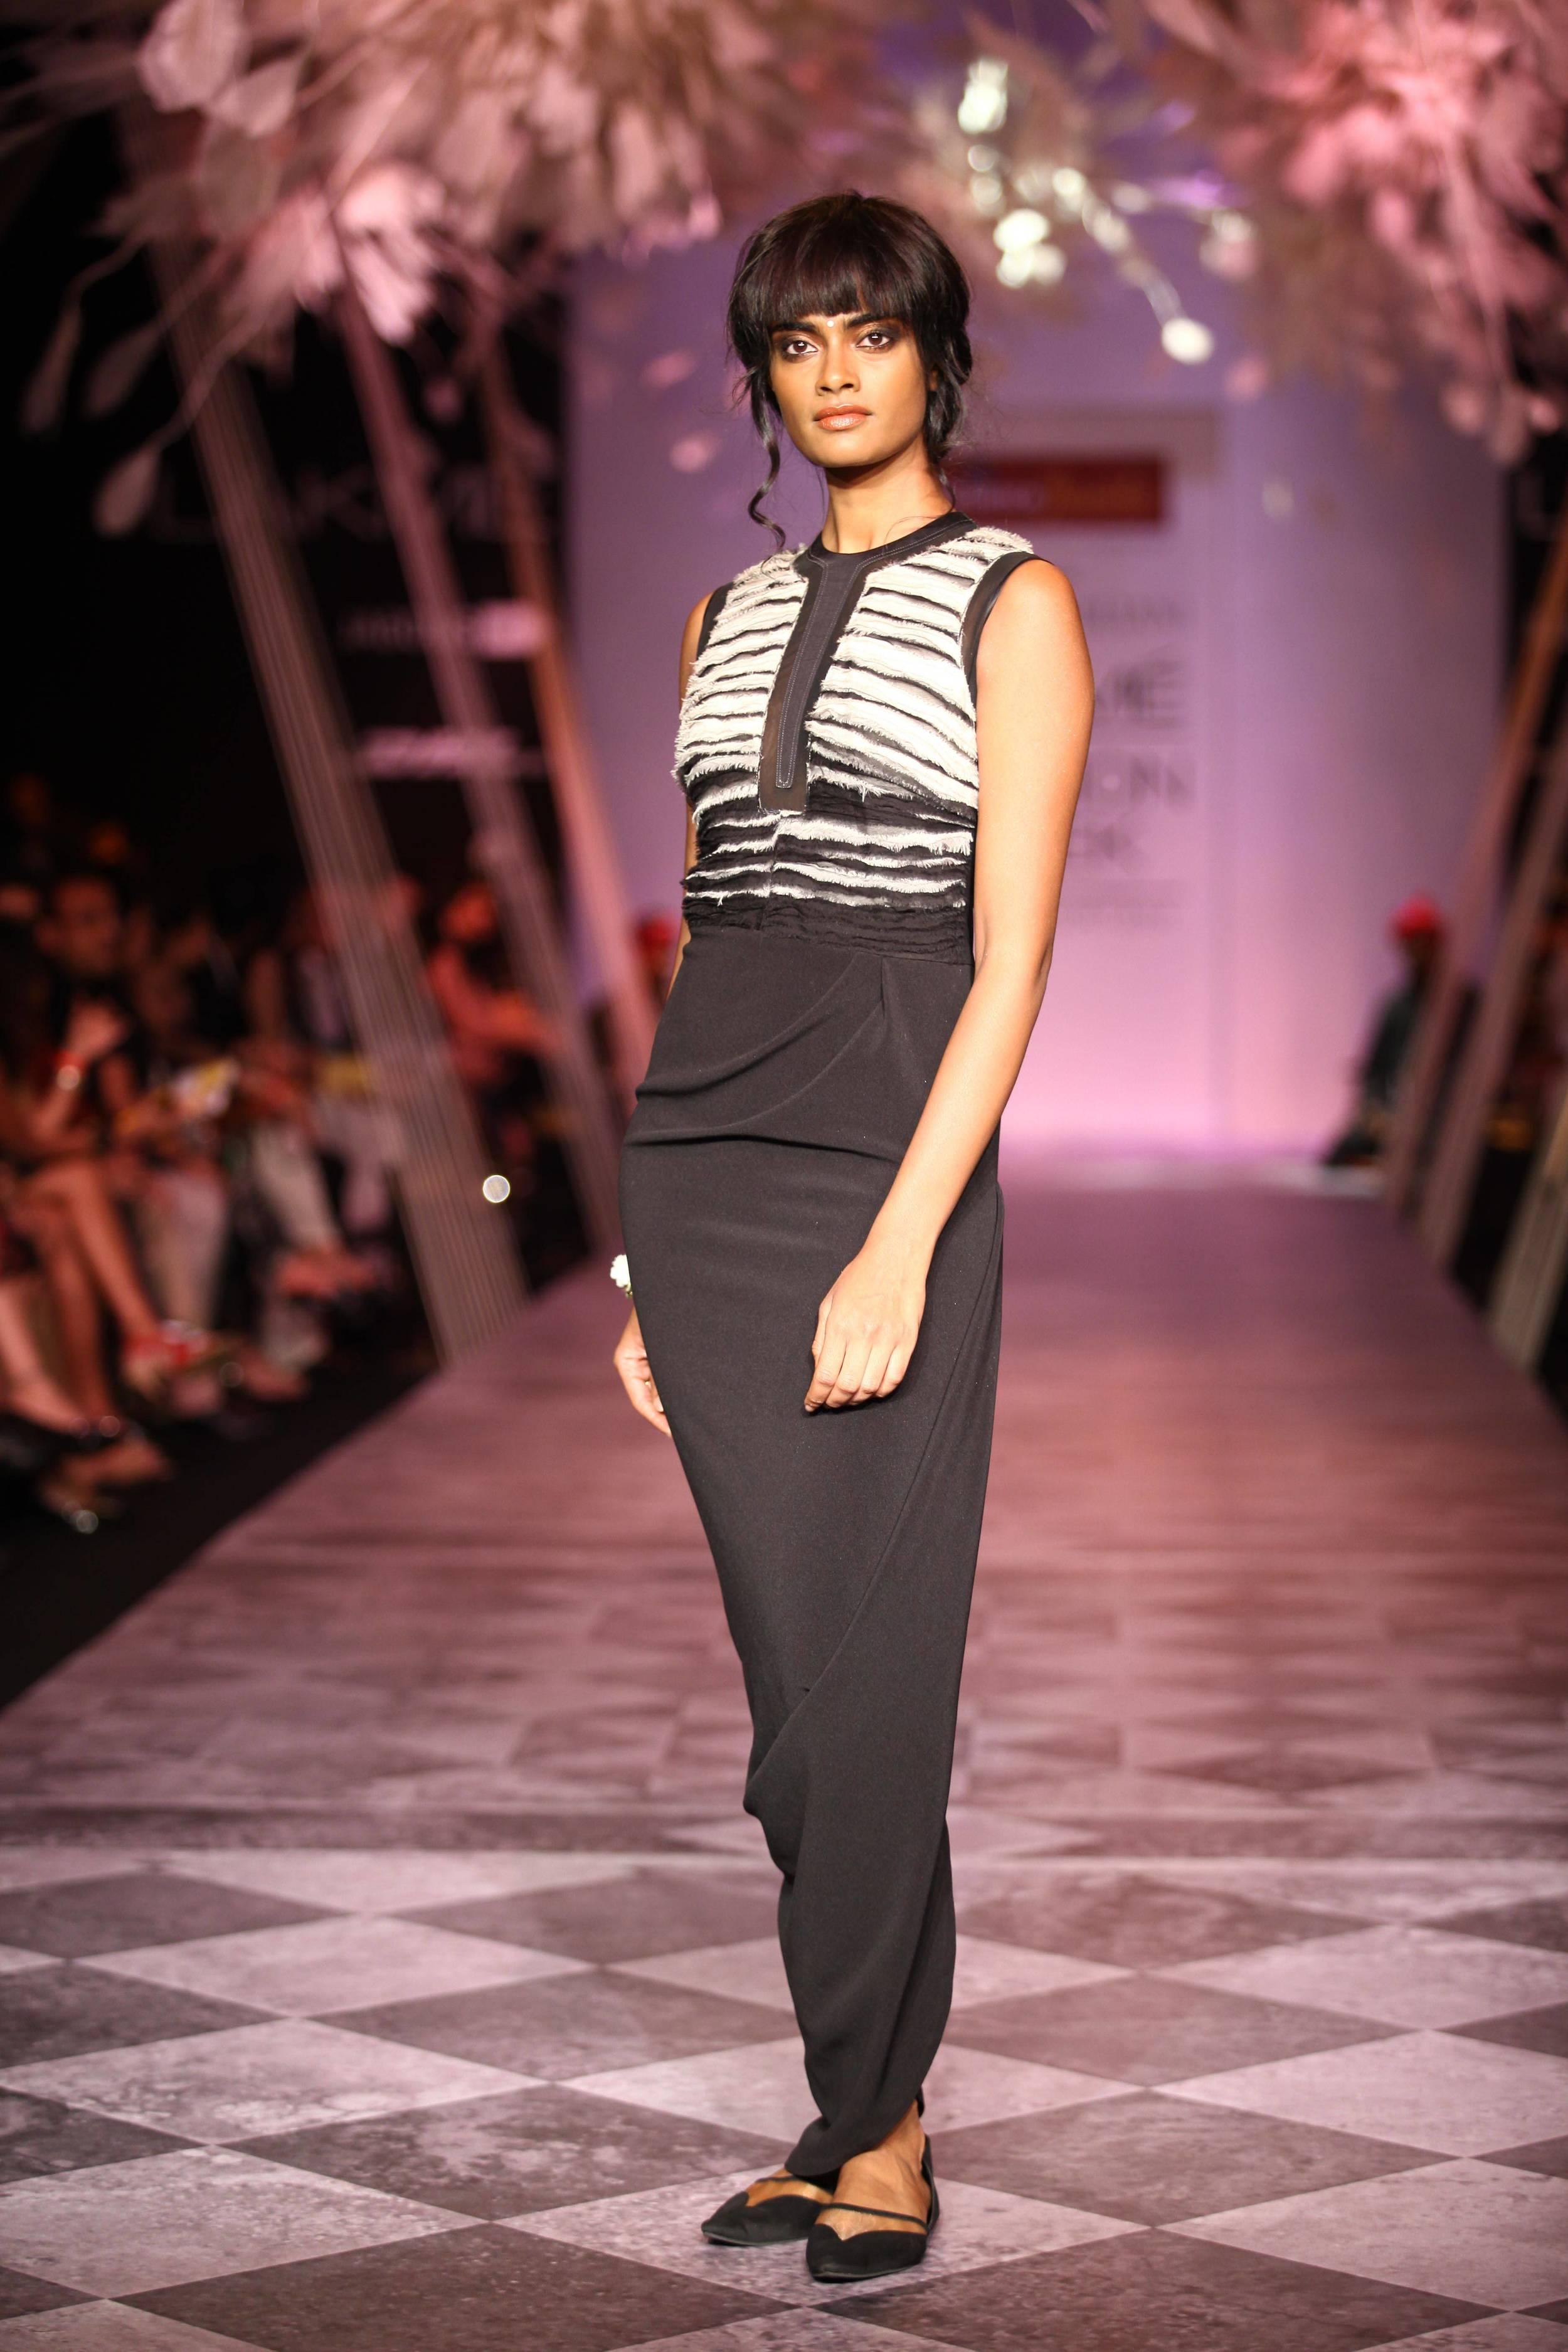 Tarun Tahiliani SS'14 Collection at LFW SR 2014 1.jpg